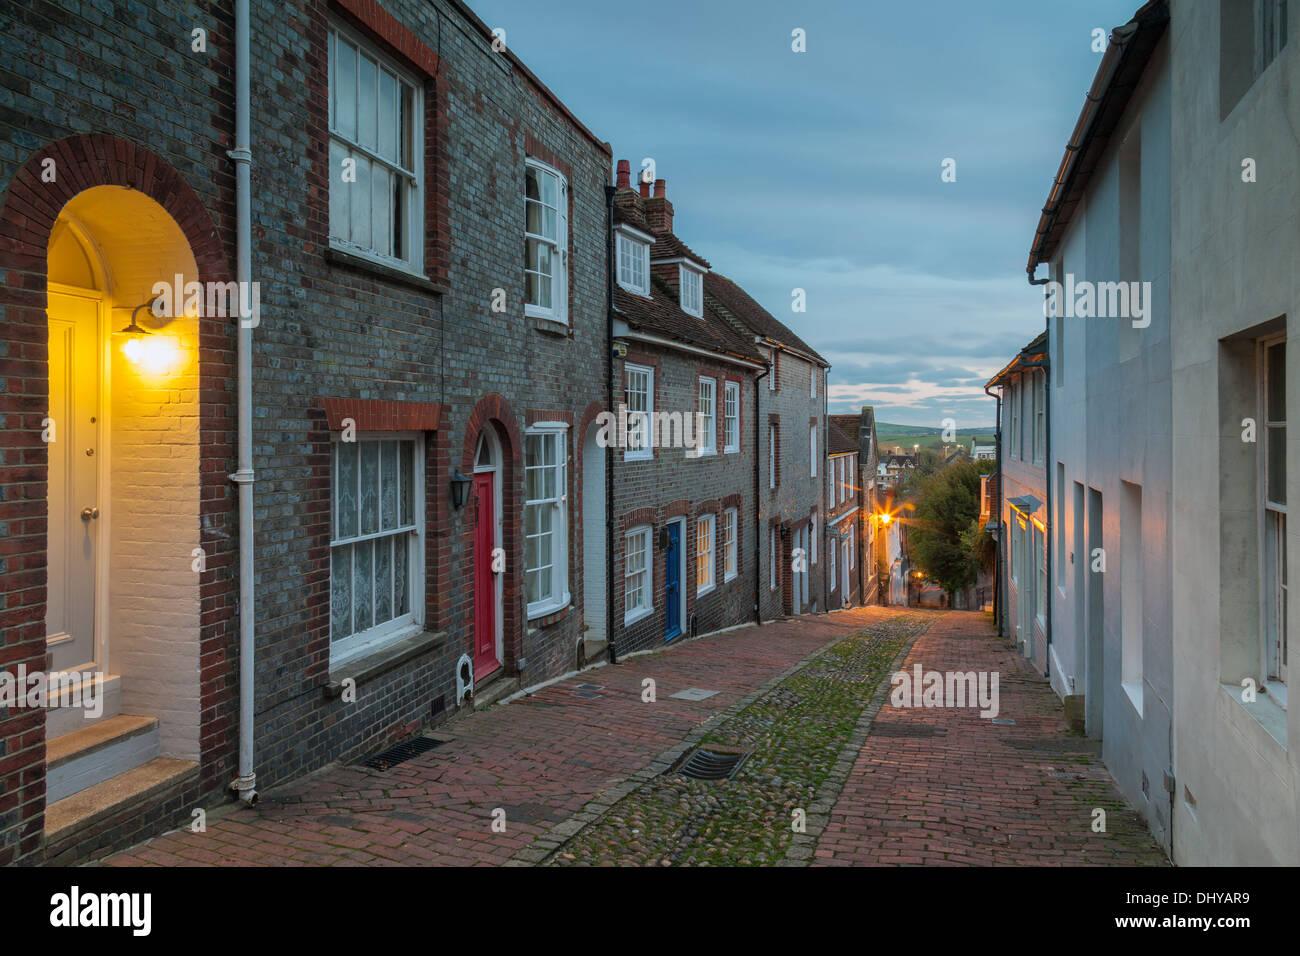 Dusk at Keere Street in Lewes, East Sussex, UK Stock Photo